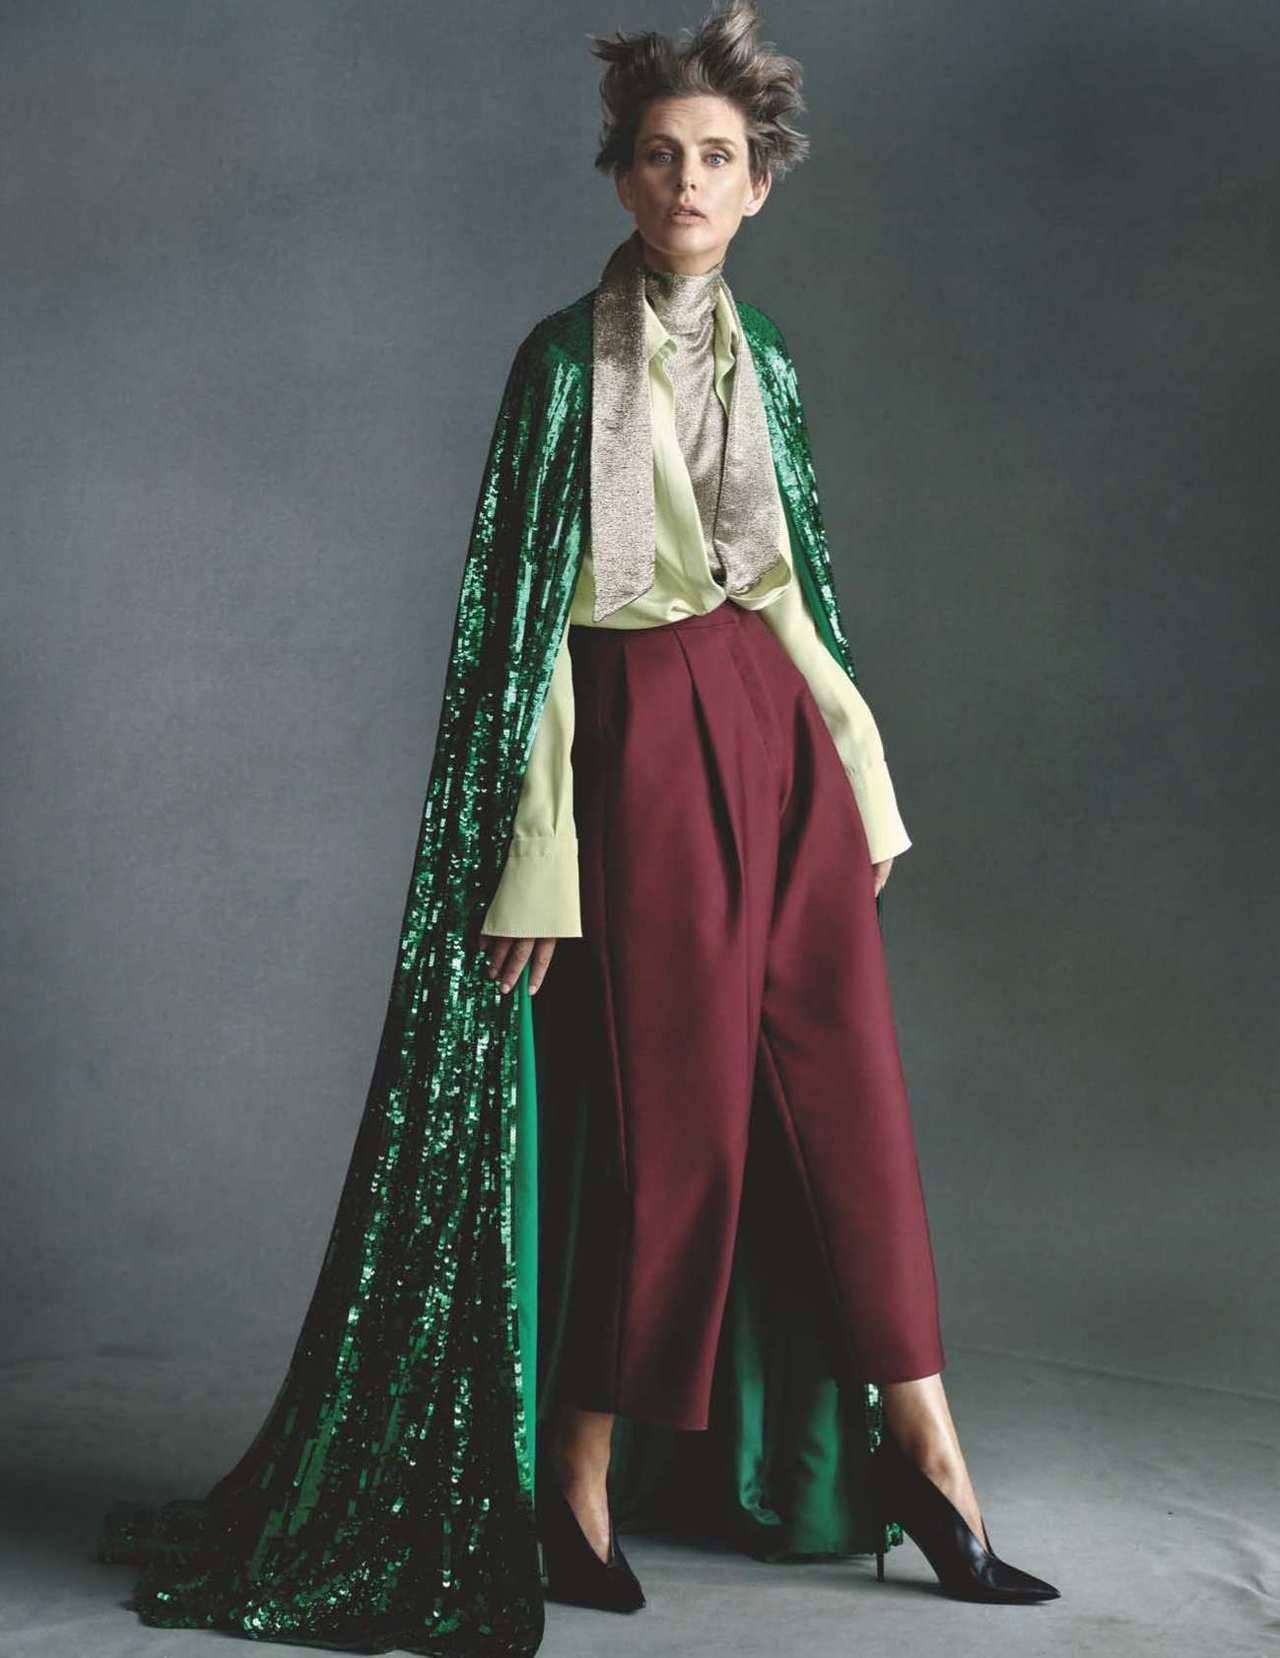 Stella Tennant by Steven Meisel for Vogue UK Dec 2018 (4).jpg